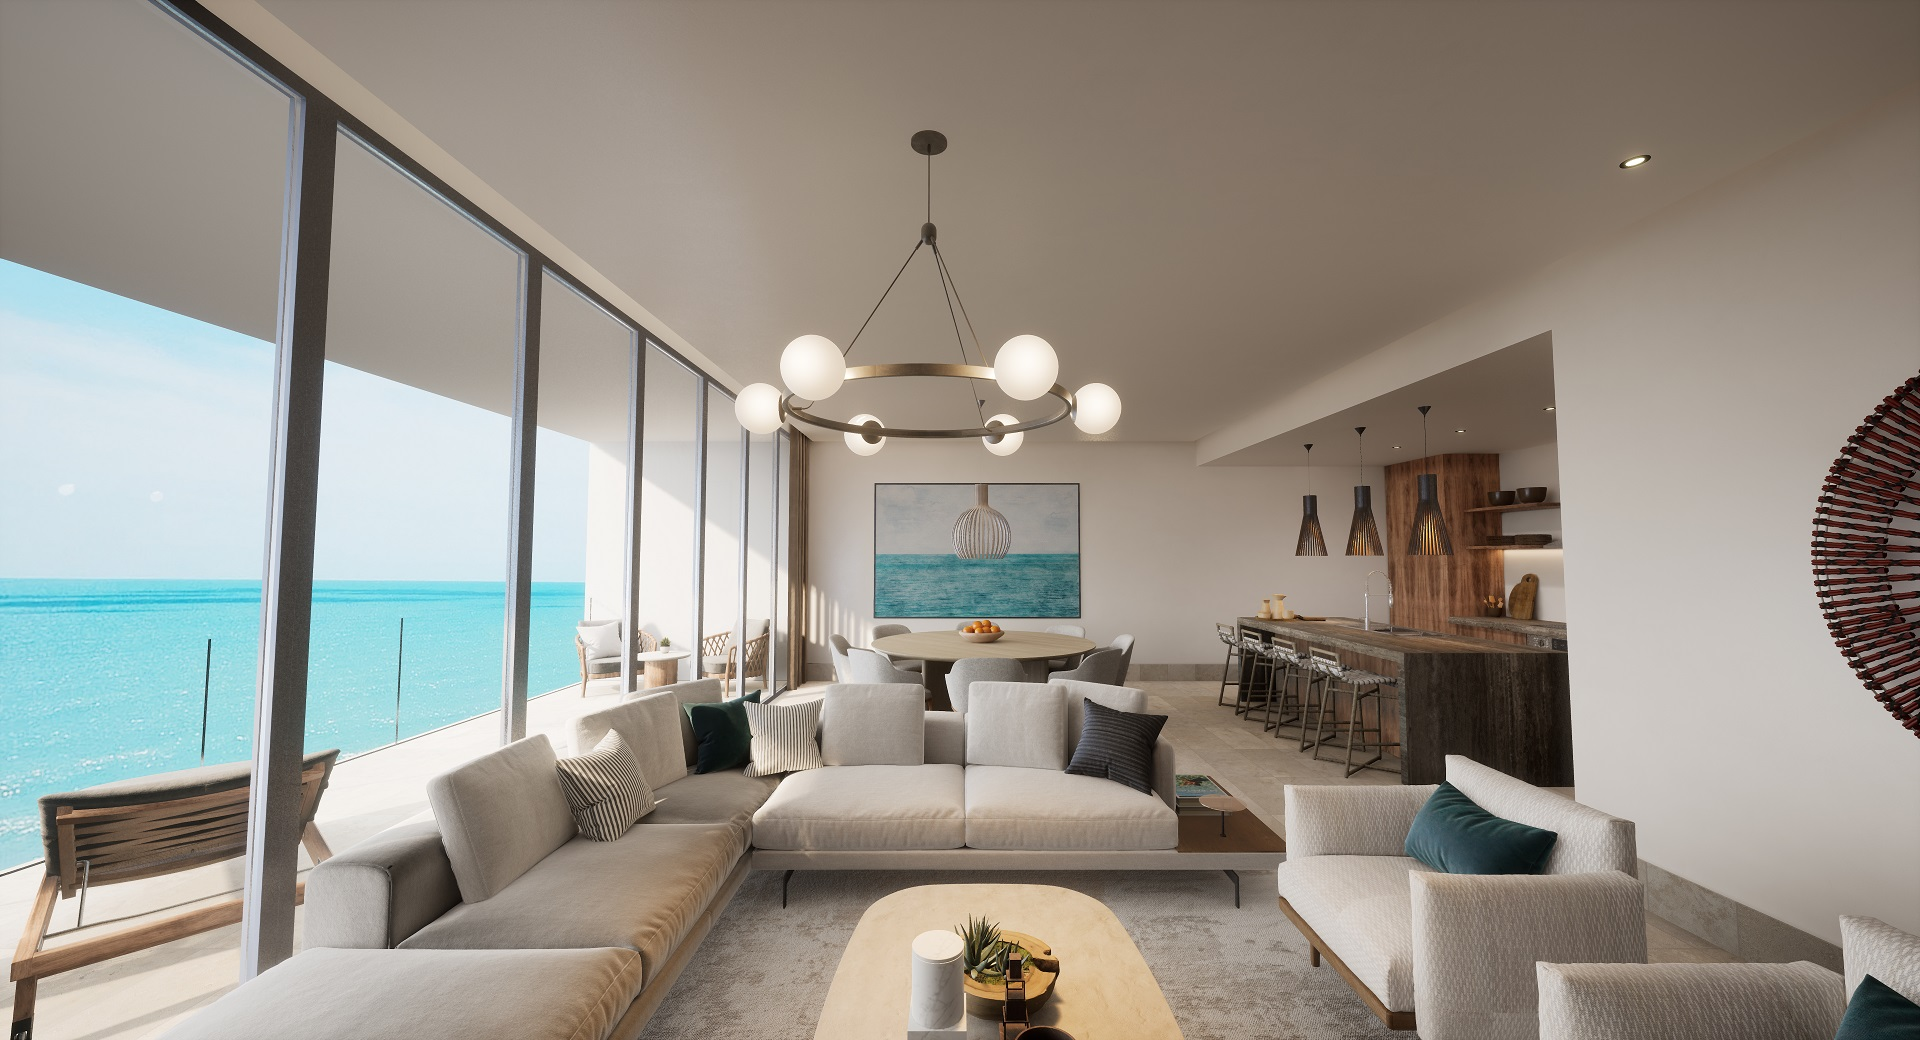 3-Bedroom Beachfront Penthouse